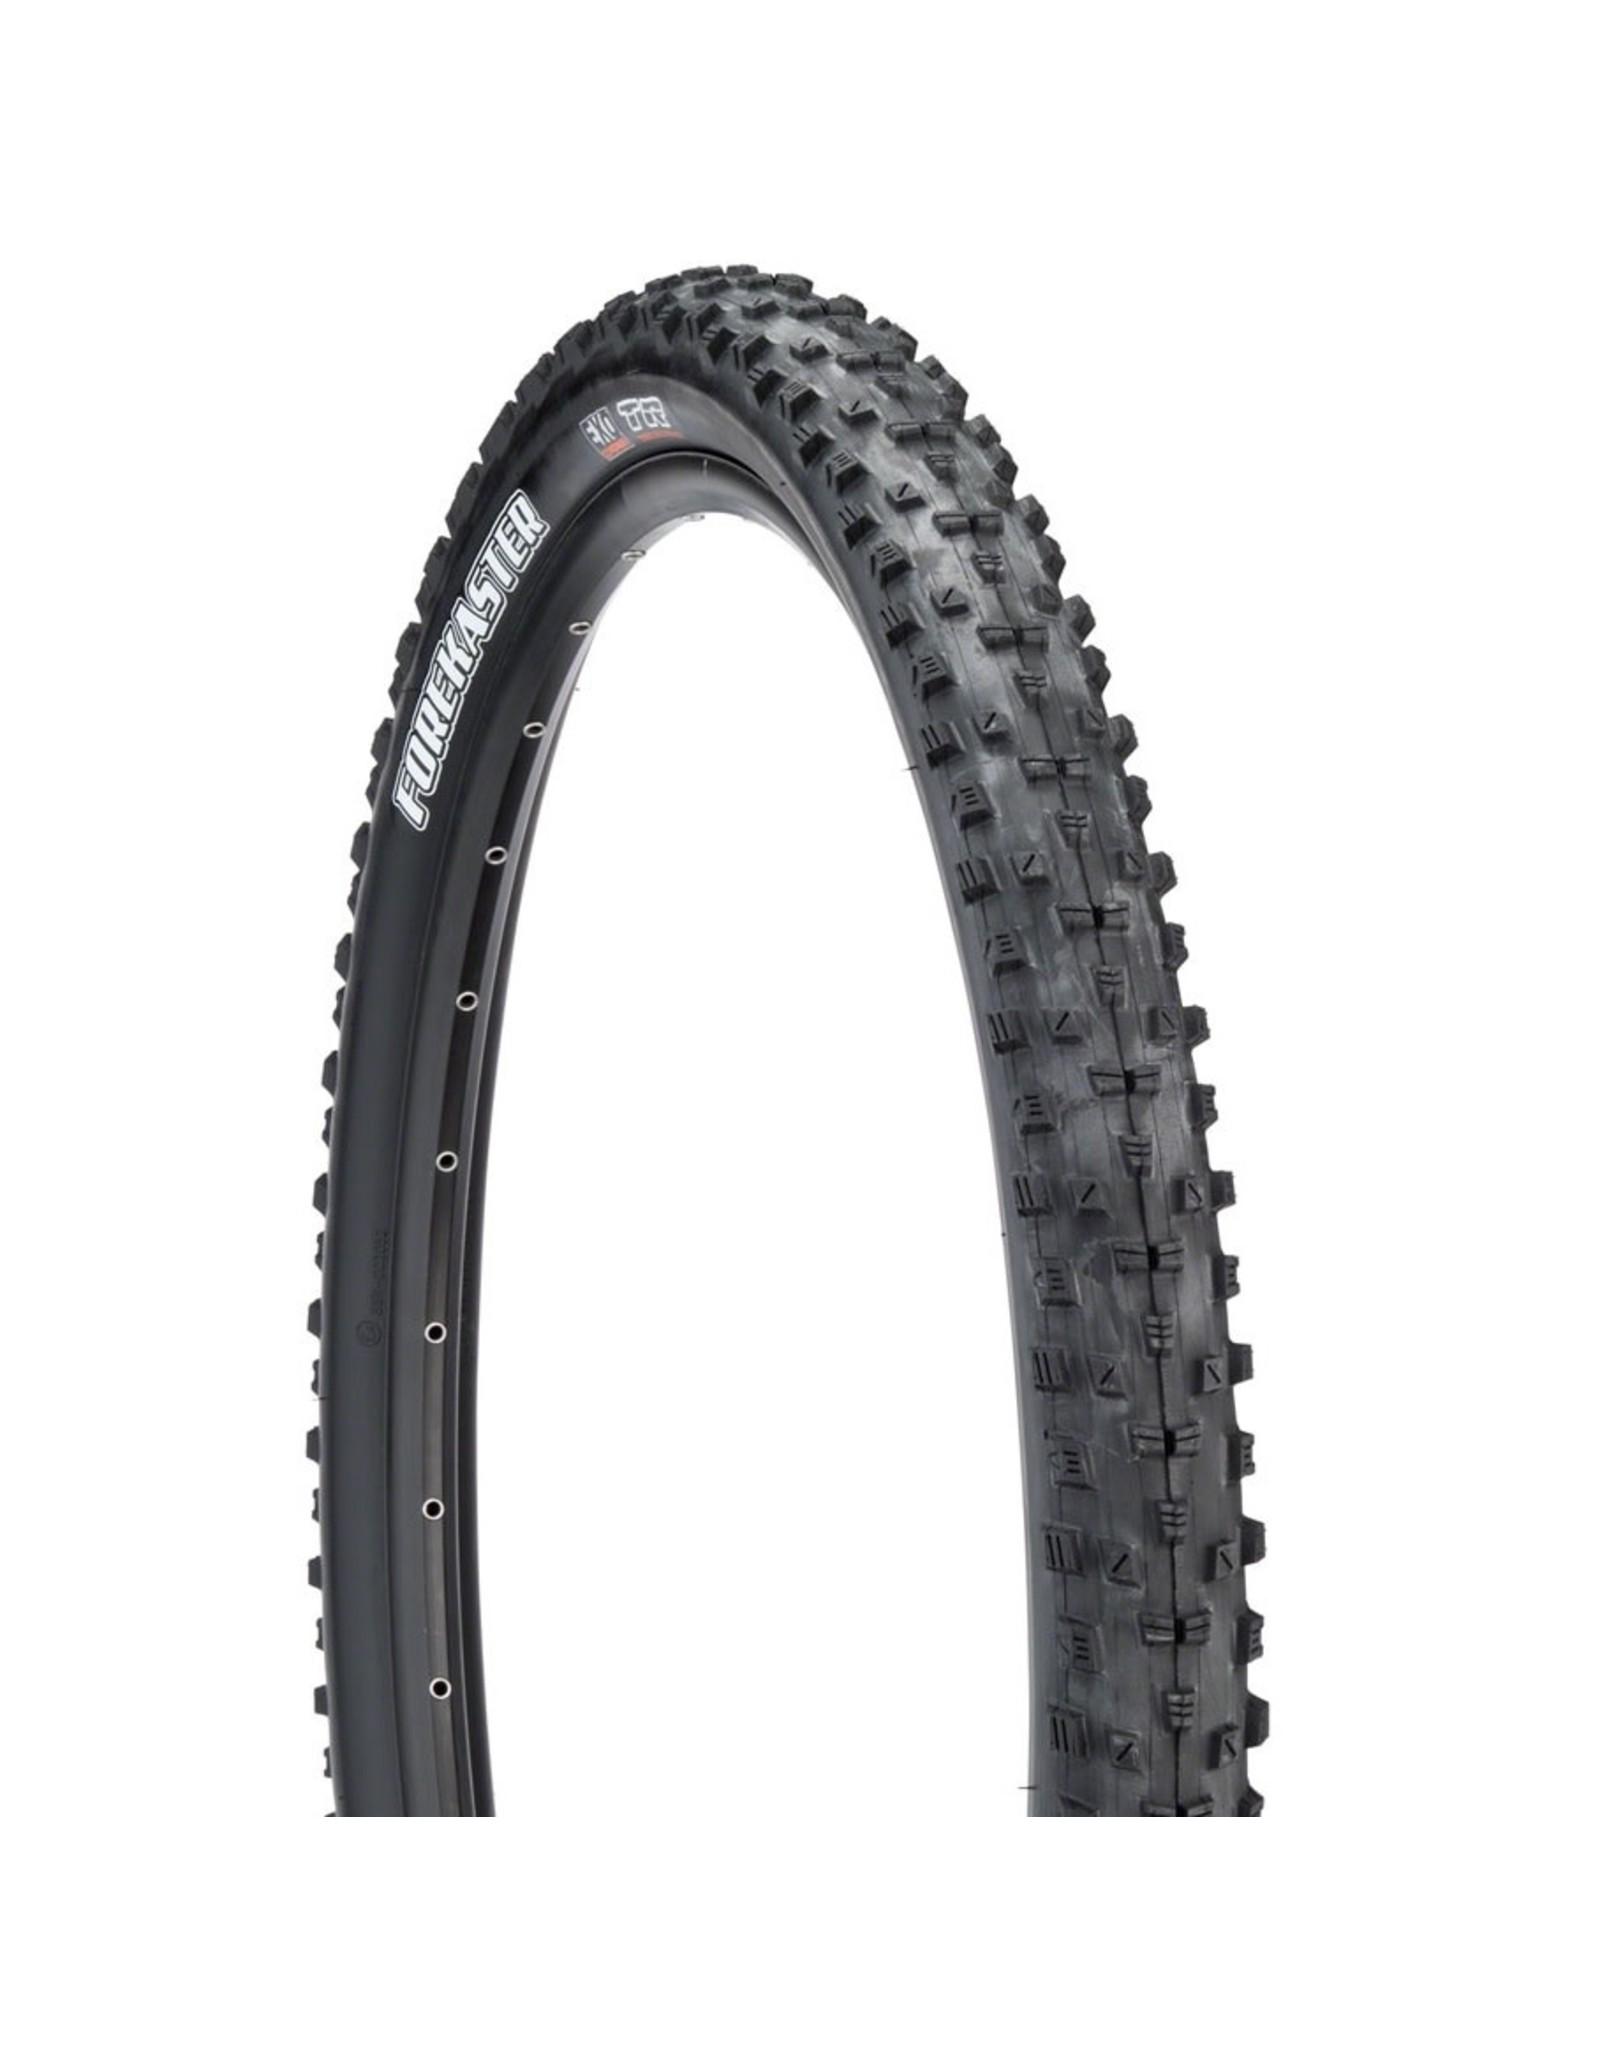 Maxxis Maxxis Forekaster Tire - 27.5 x 2.35, Tubeless, Folding, Black, Dual, EXO